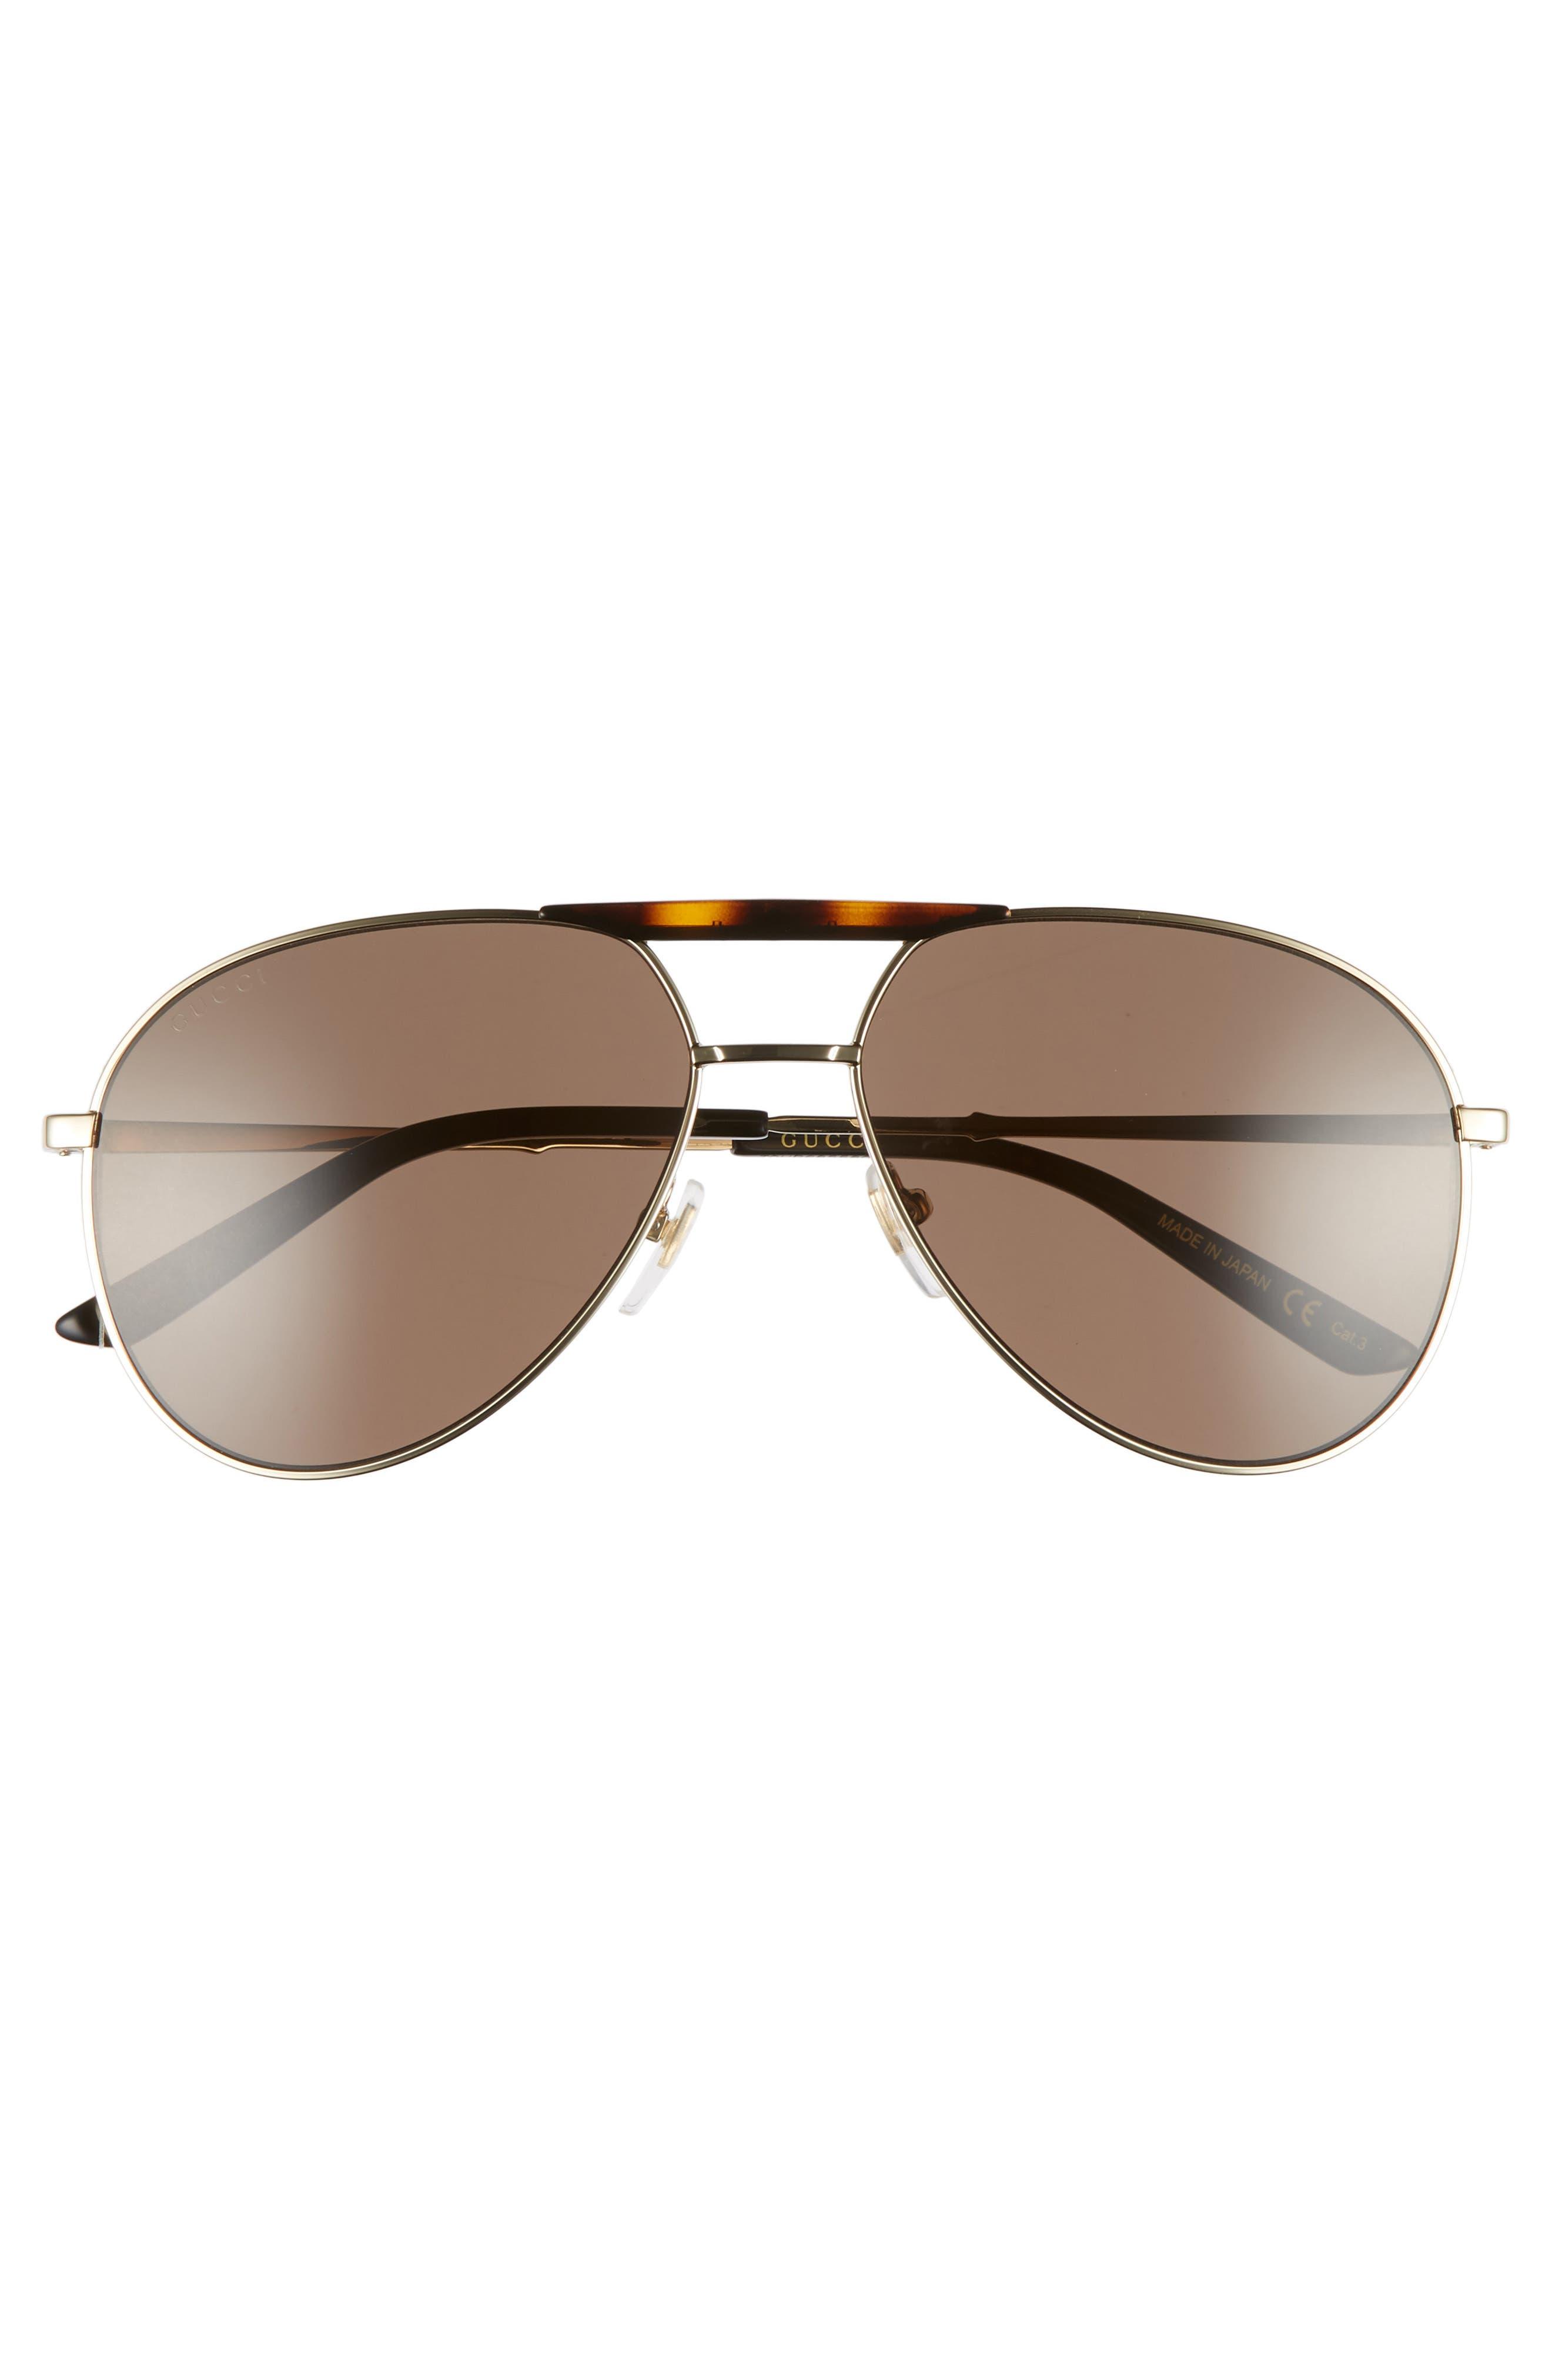 GUCCI, Cruise 59mm Aviator Sunglasses, Alternate thumbnail 2, color, GOLD/ BLACK